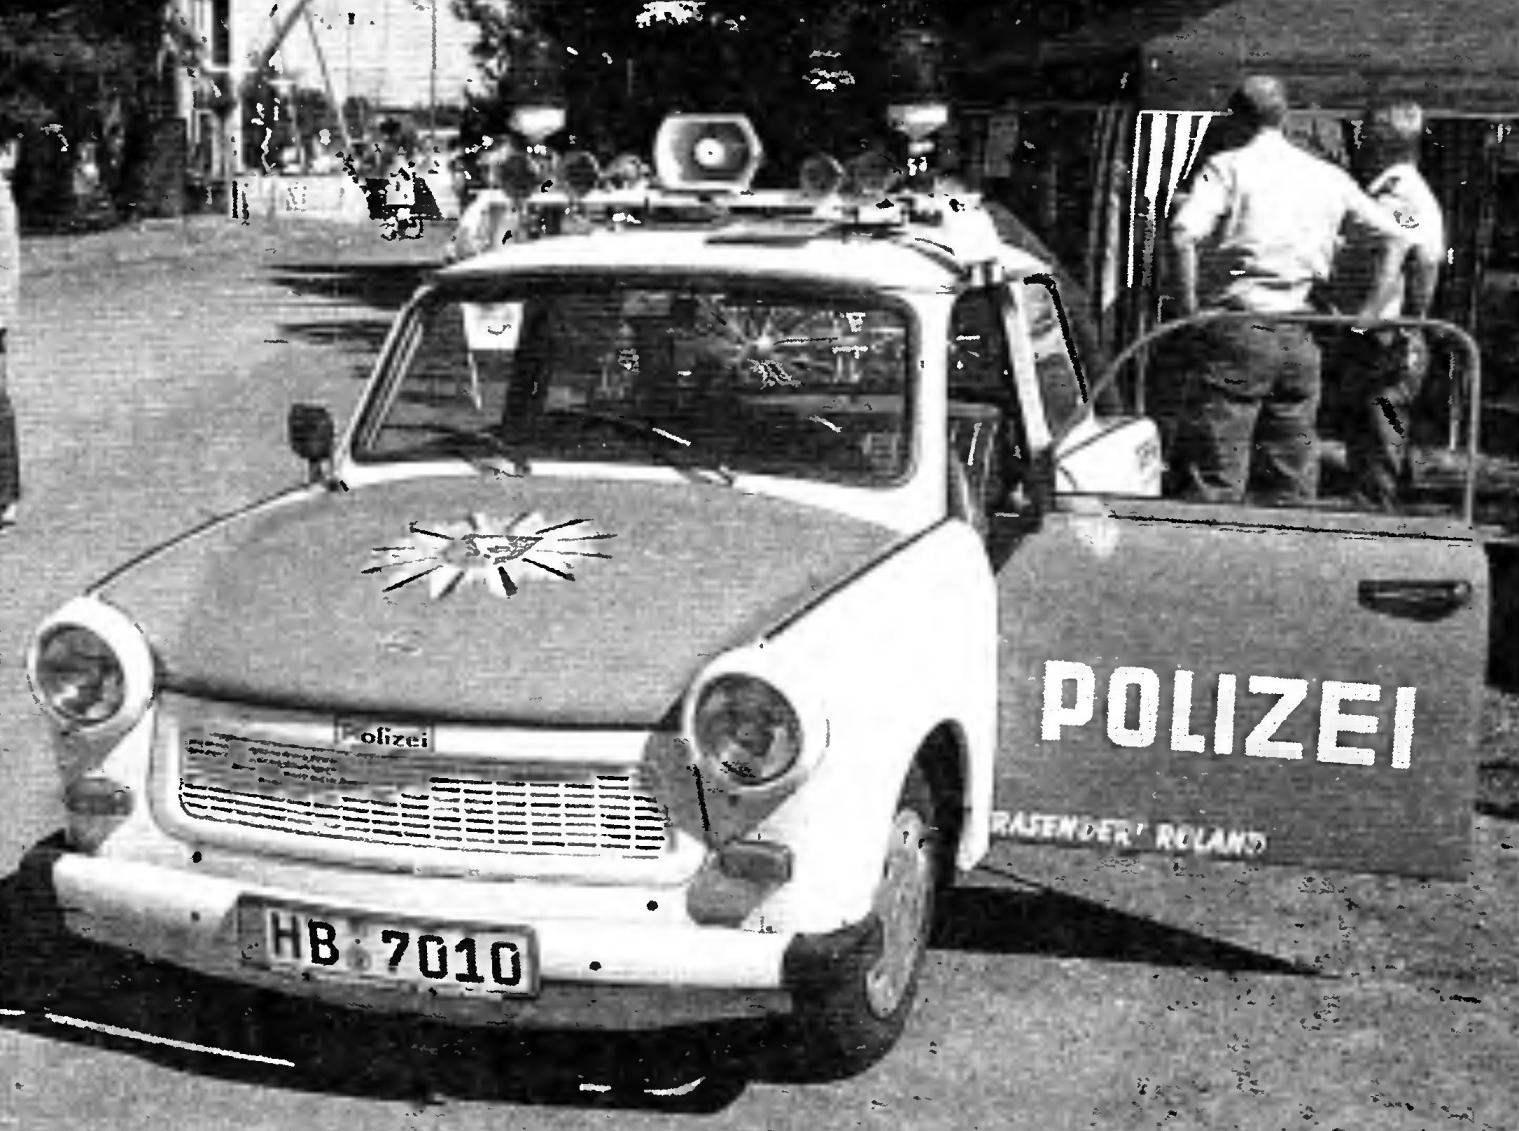 Полицейский вариант Trabant Р601